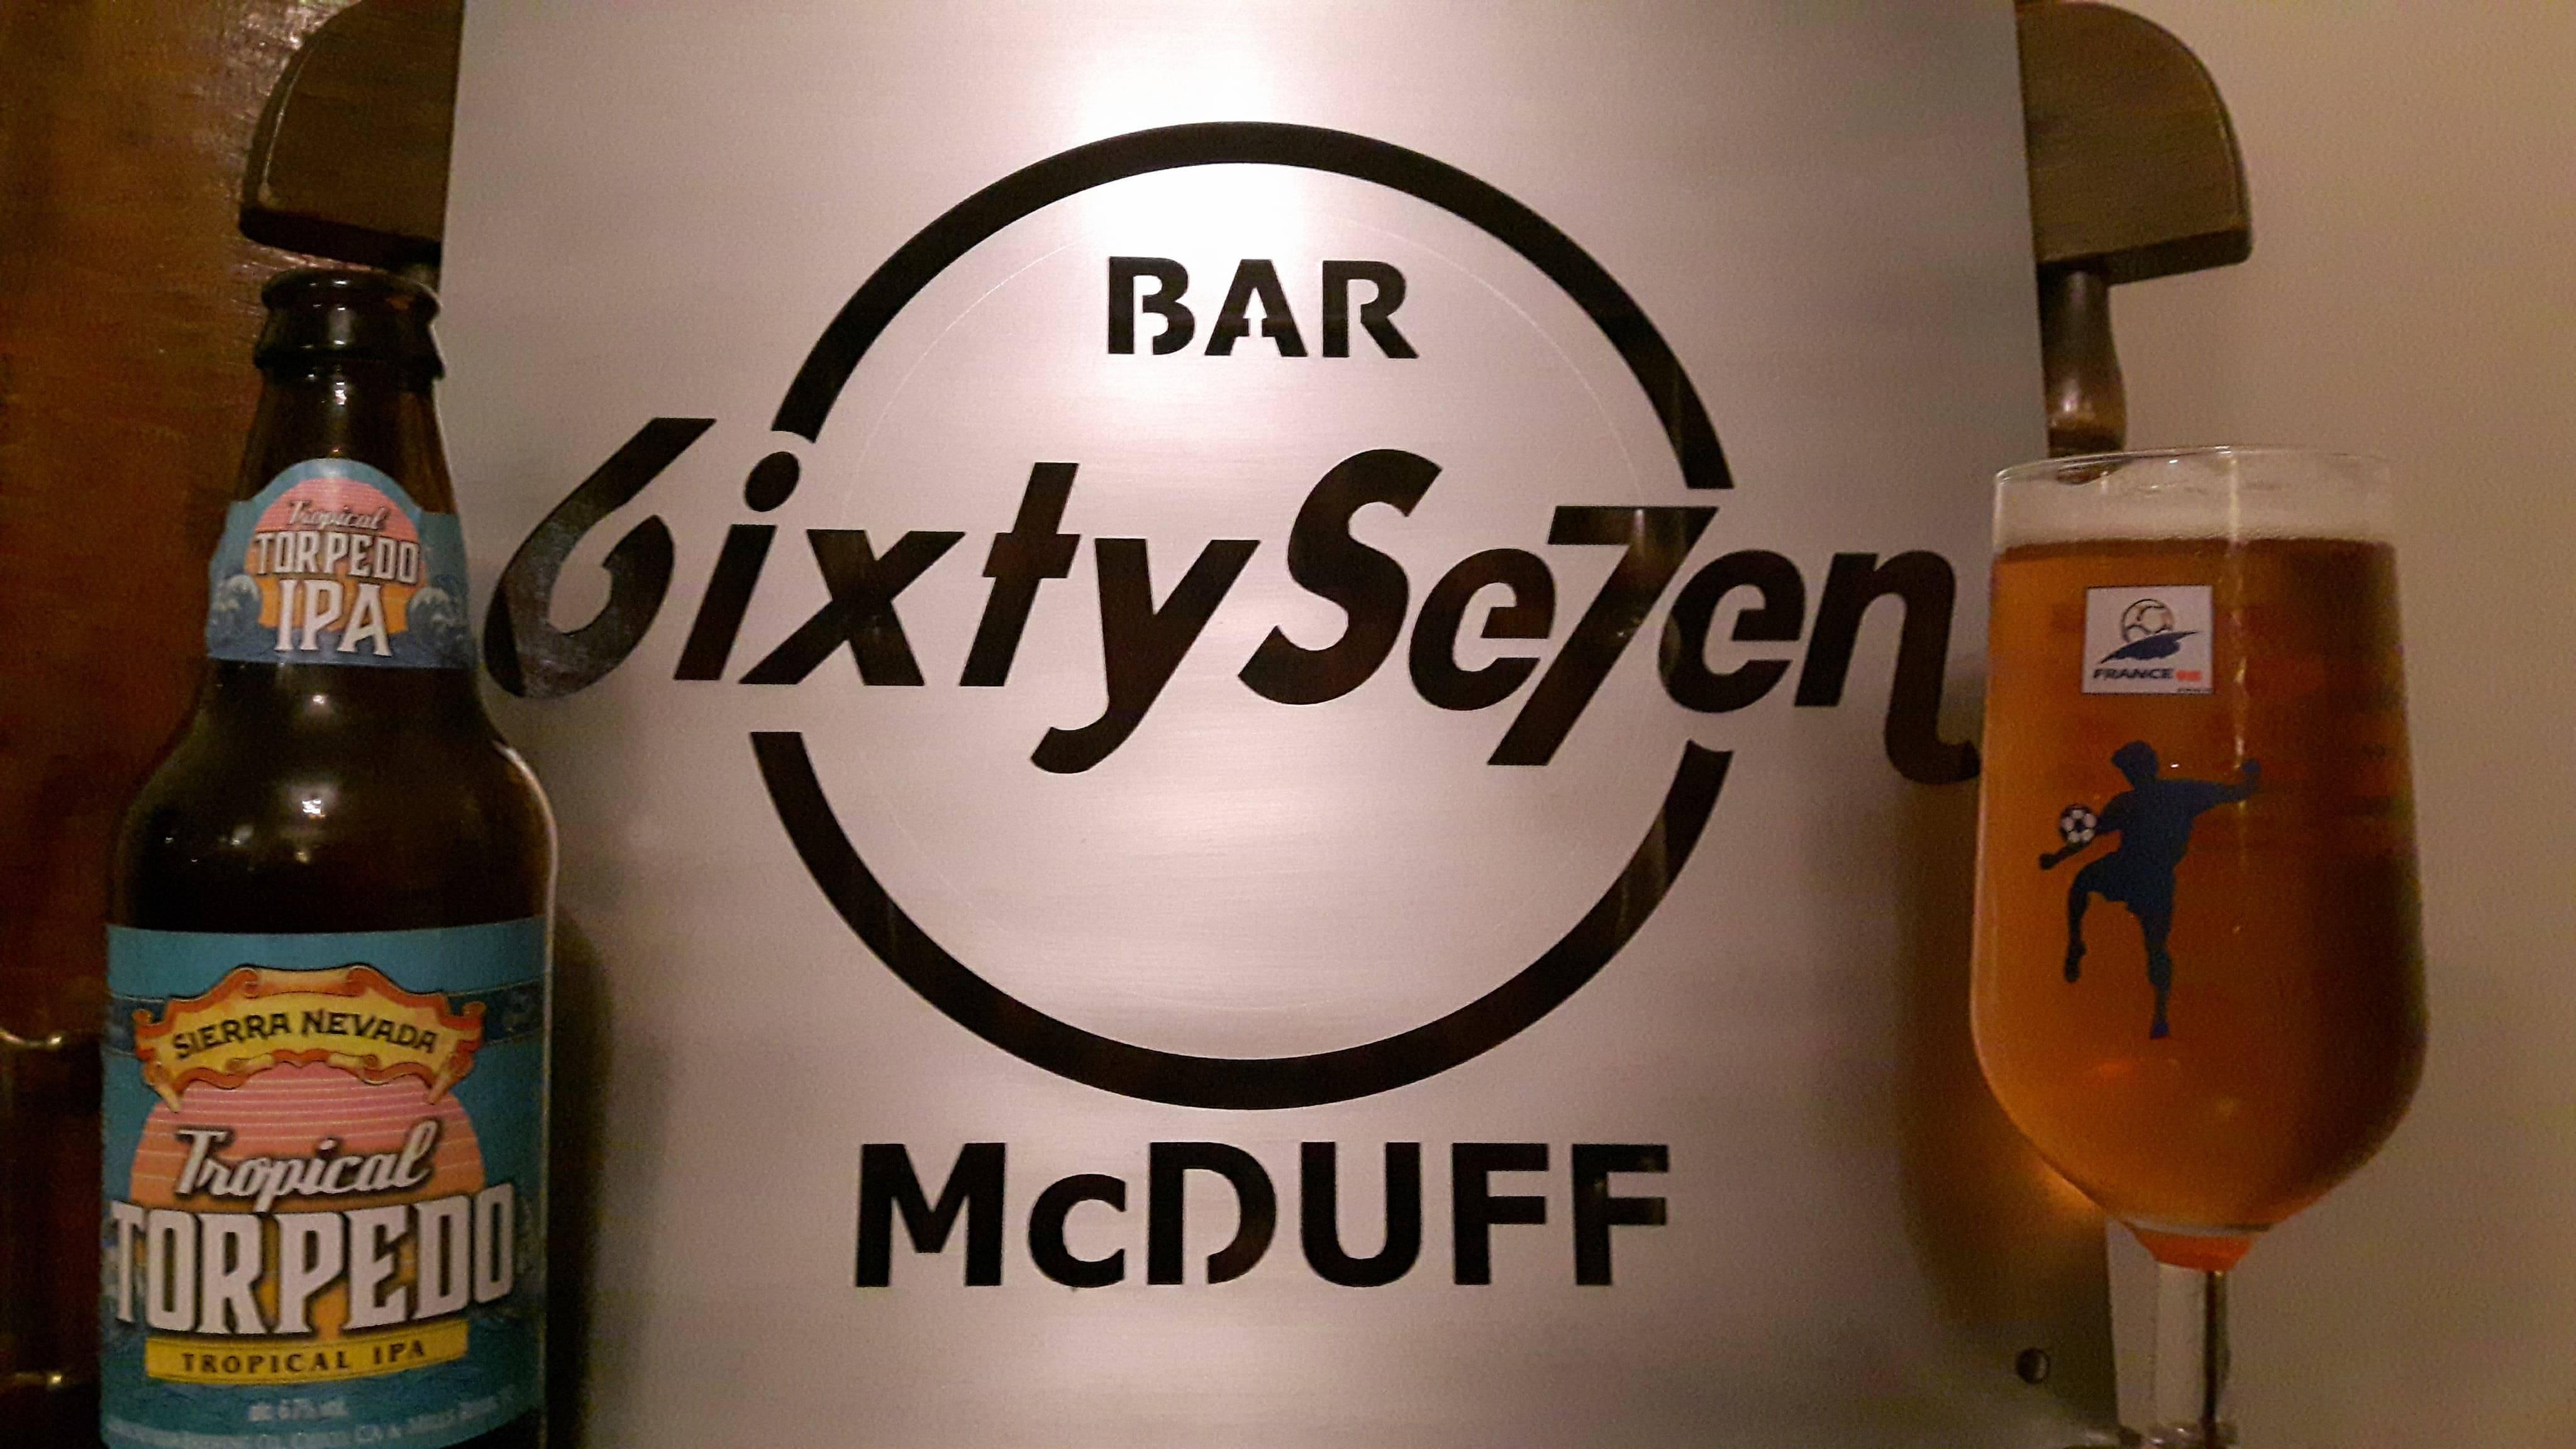 Bar 6ixty Se7en